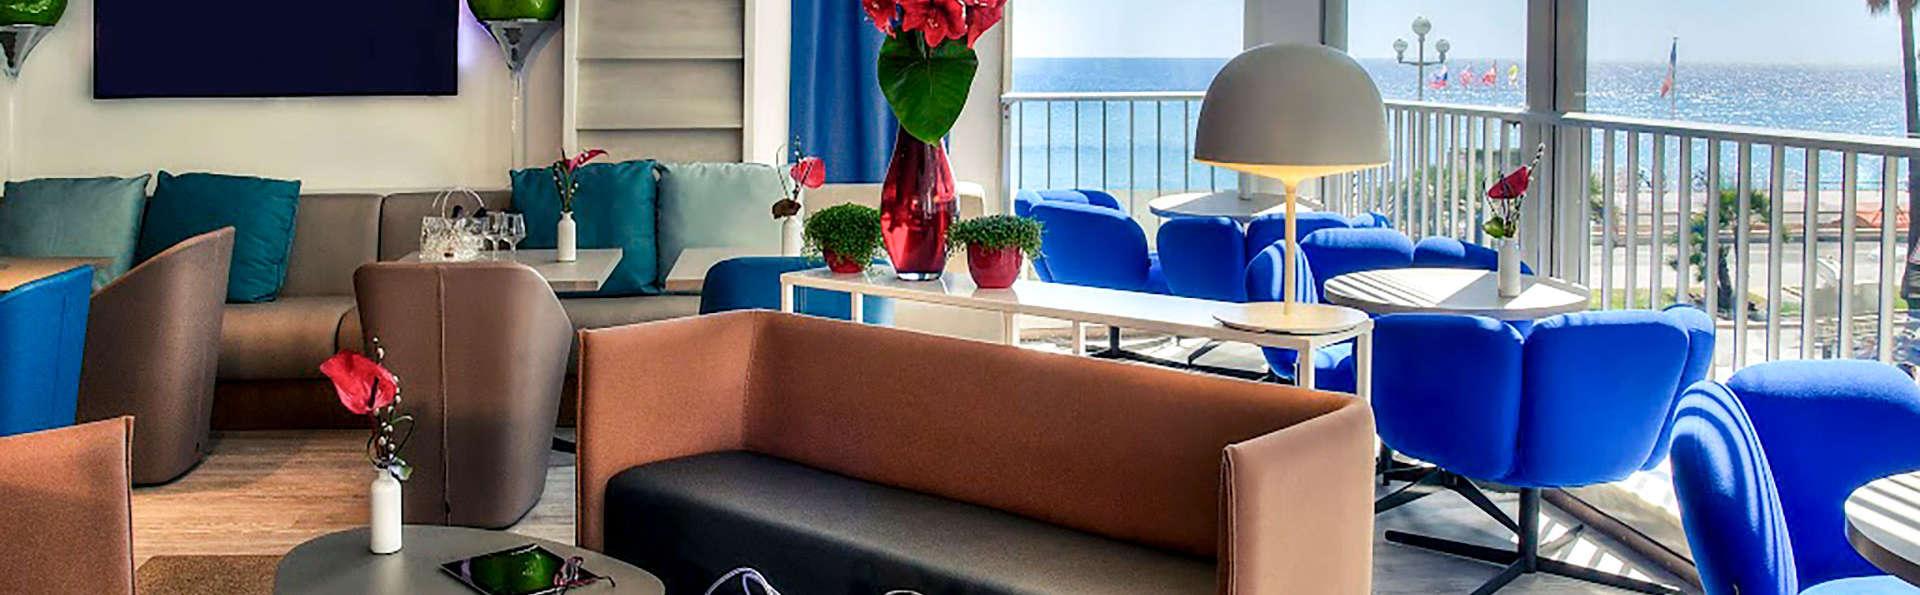 Hôtel Mercure Nice Promenade des Anglais - EDIT_LOUNGE_01.jpg